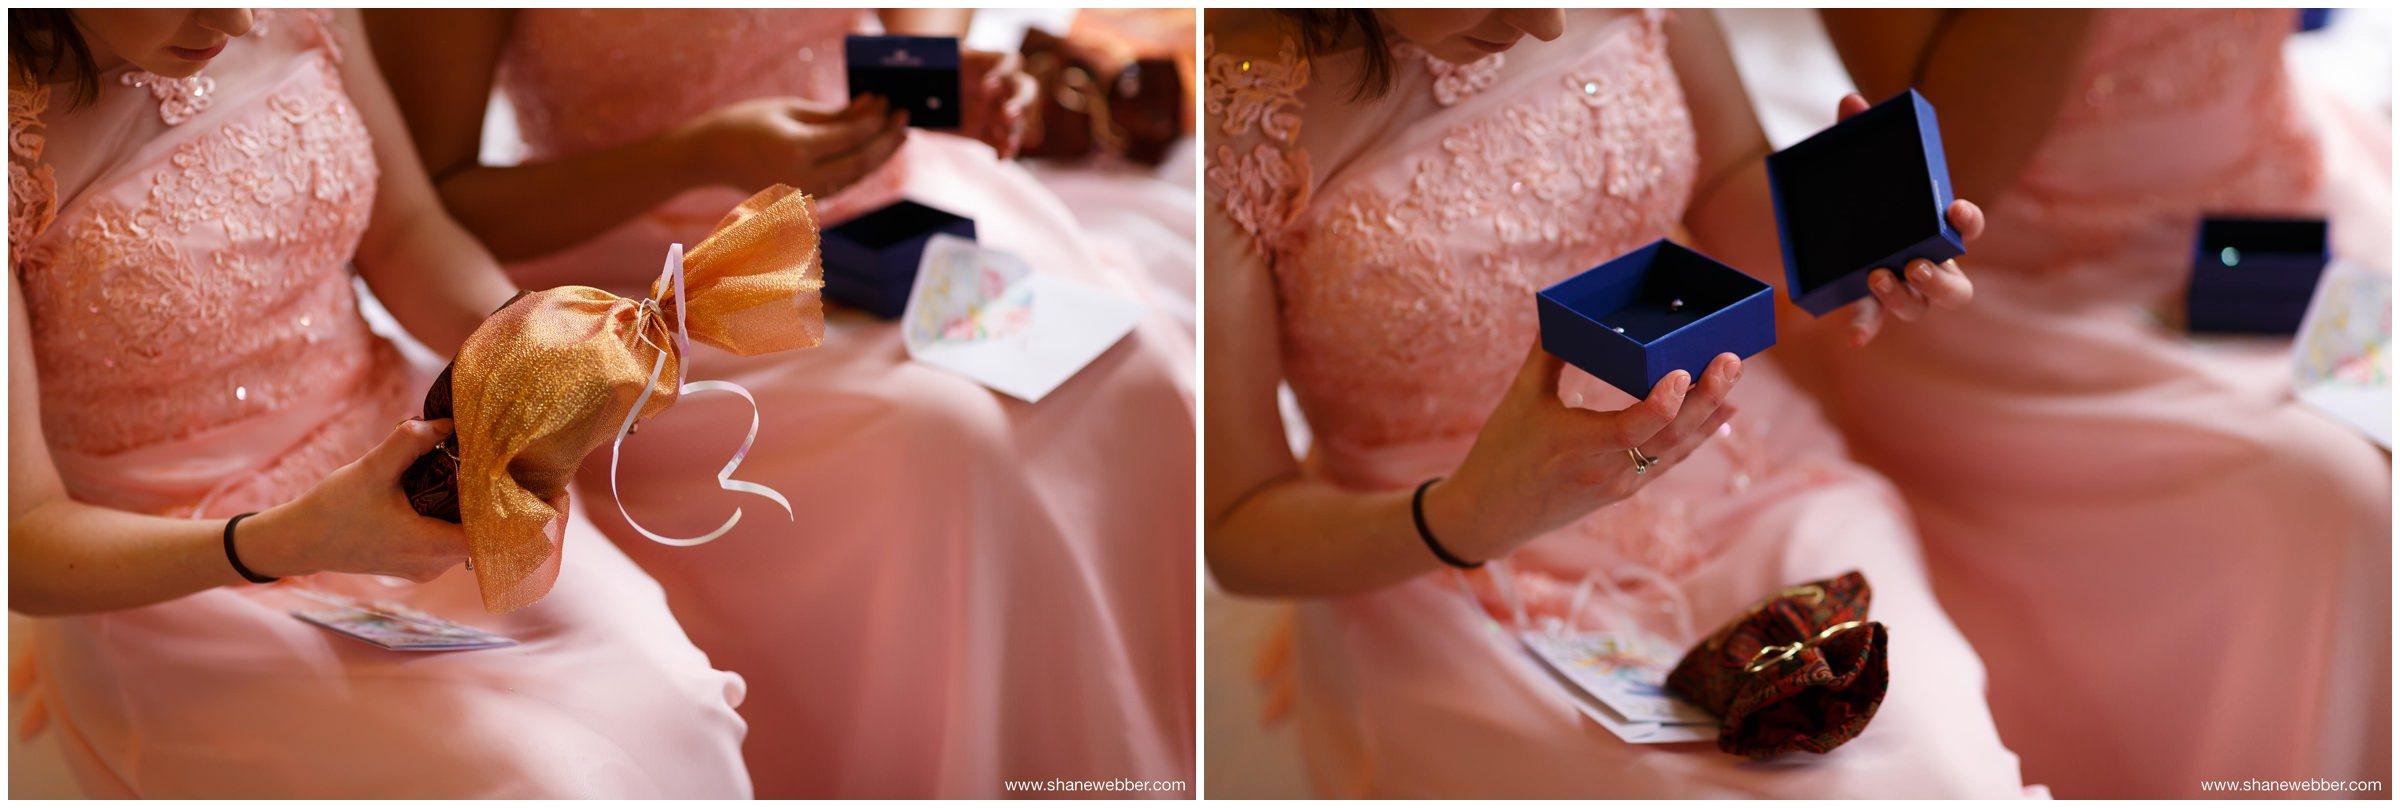 Iranian wedding presents